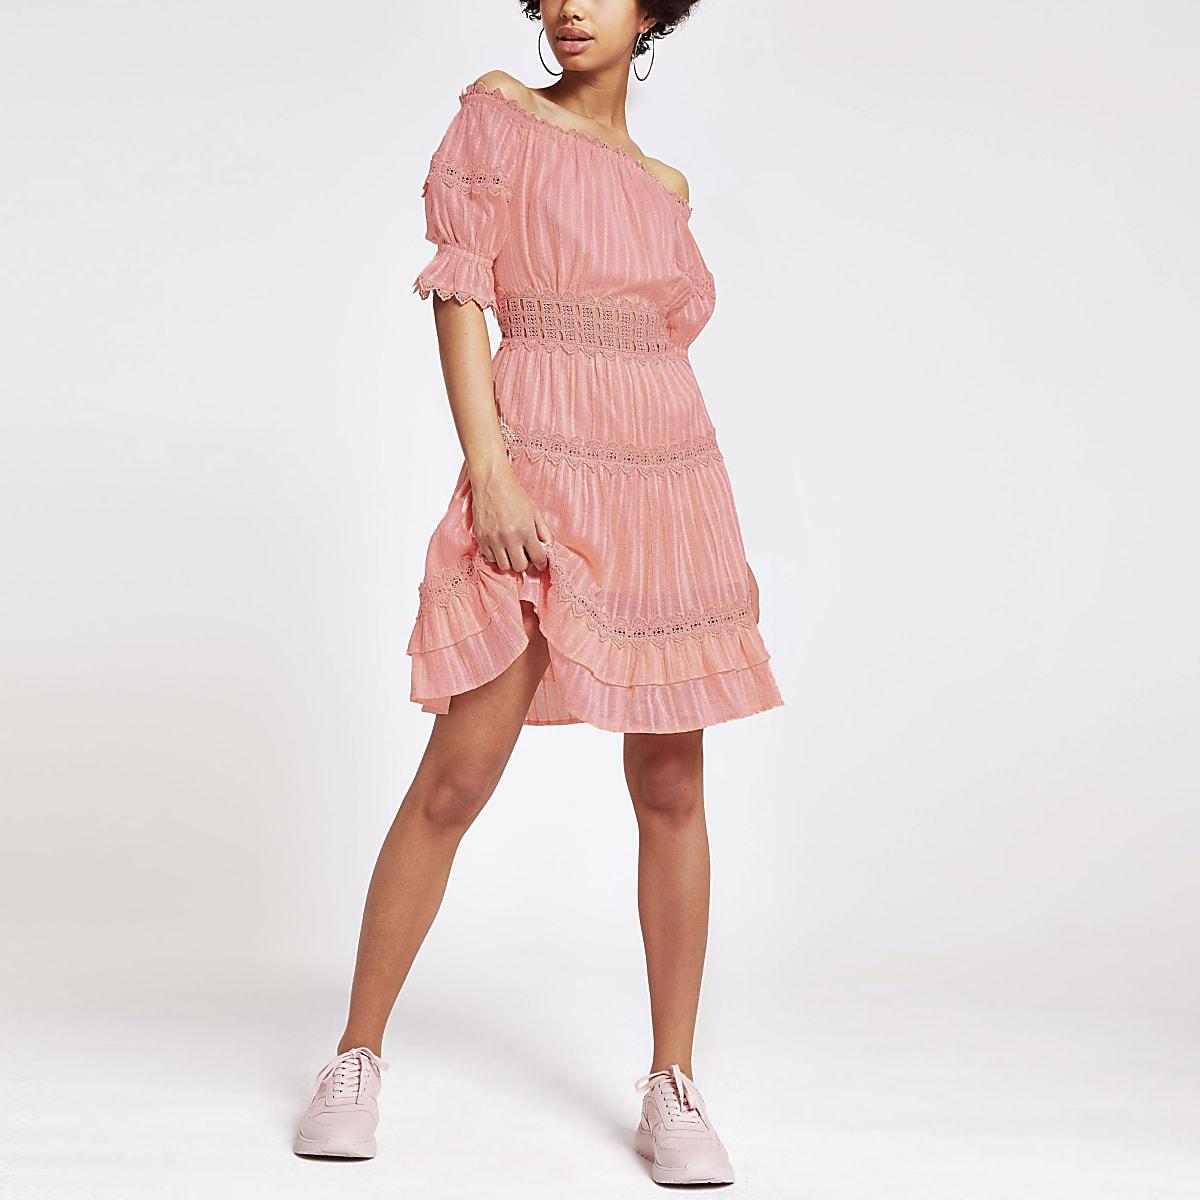 Coral lace bardot dress